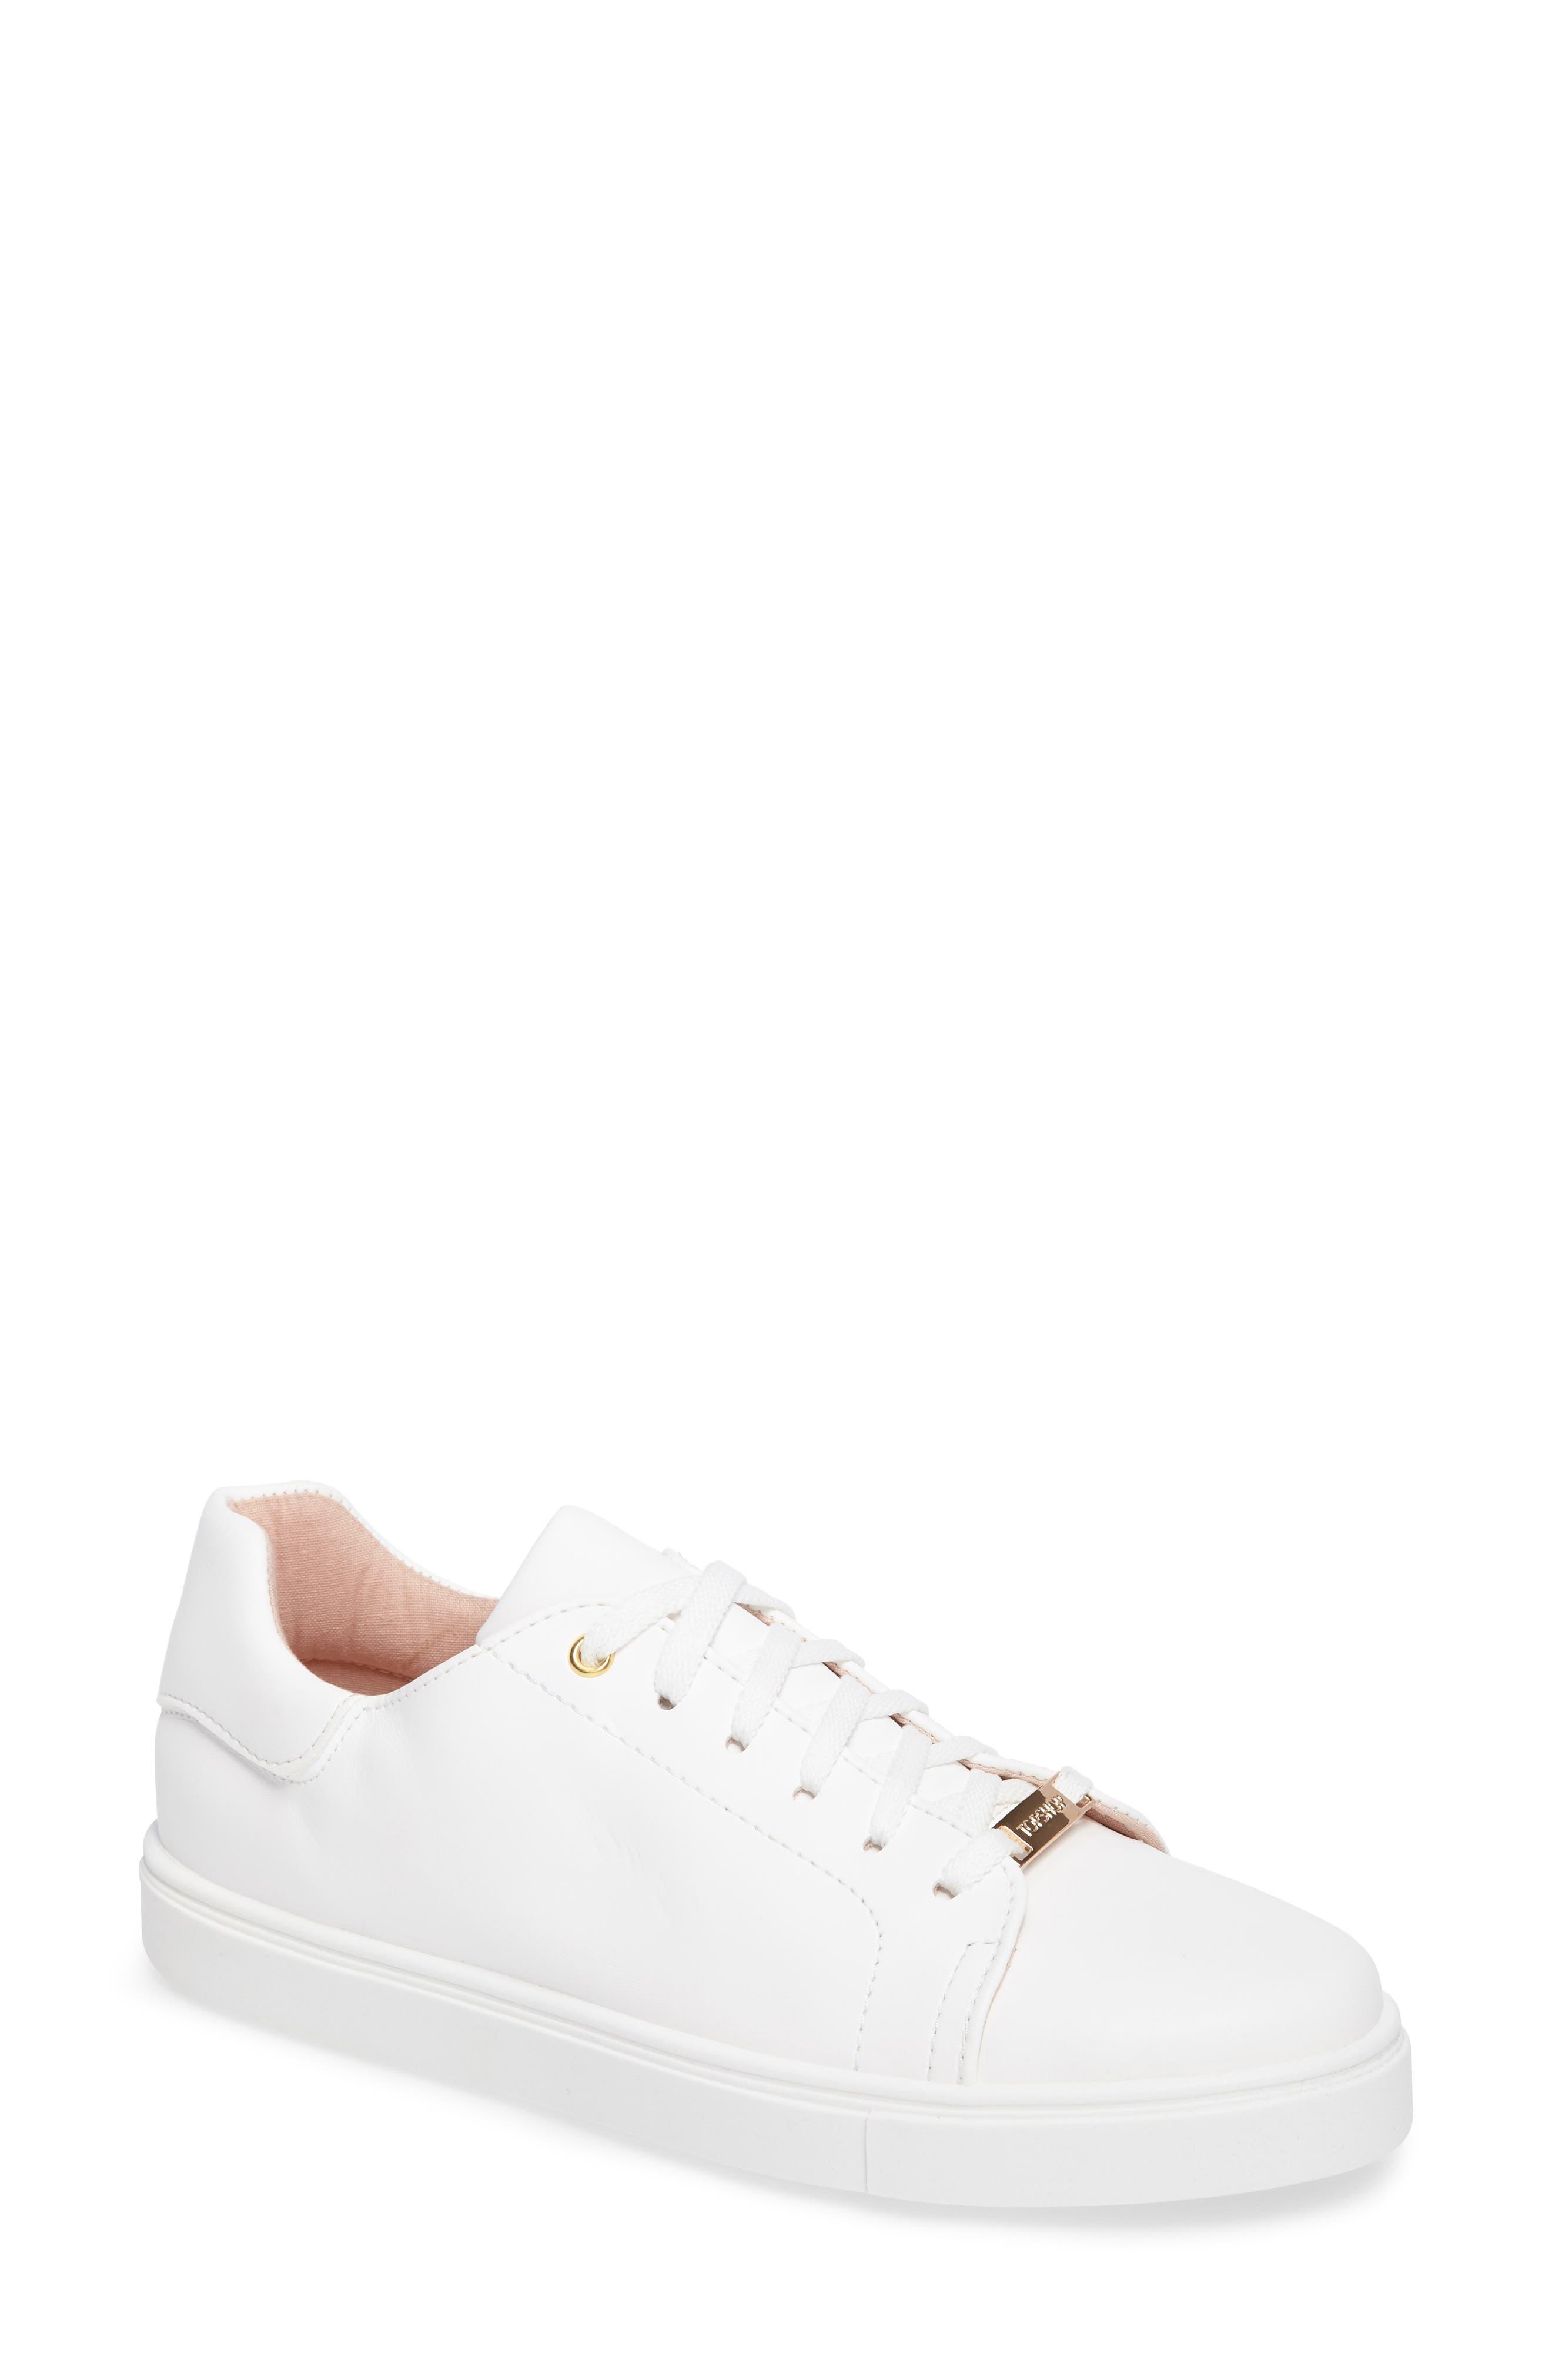 Cluster Sneaker,                         Main,                         color, 100